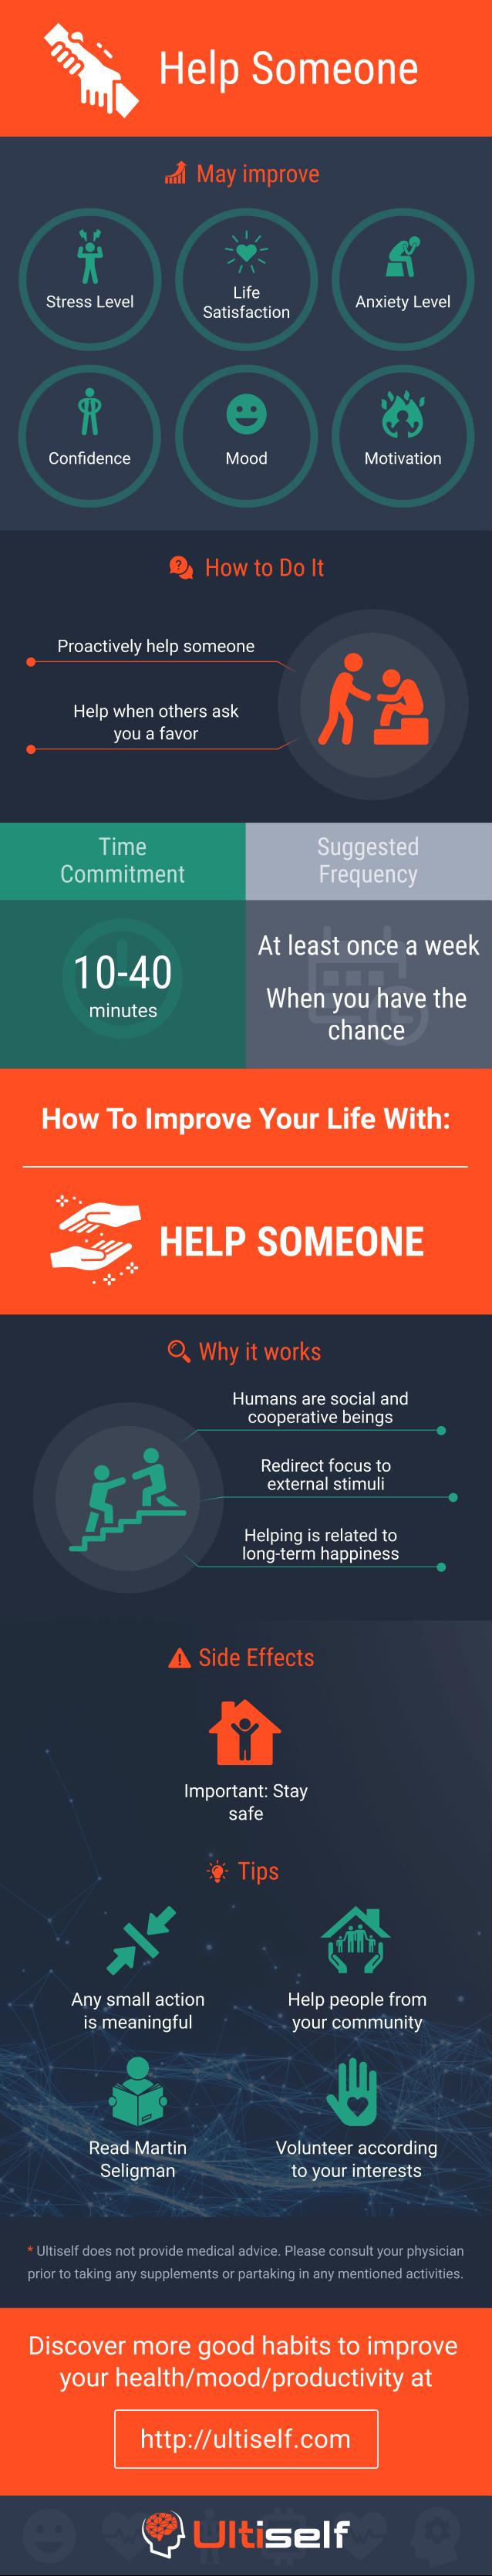 Help Someone infographic